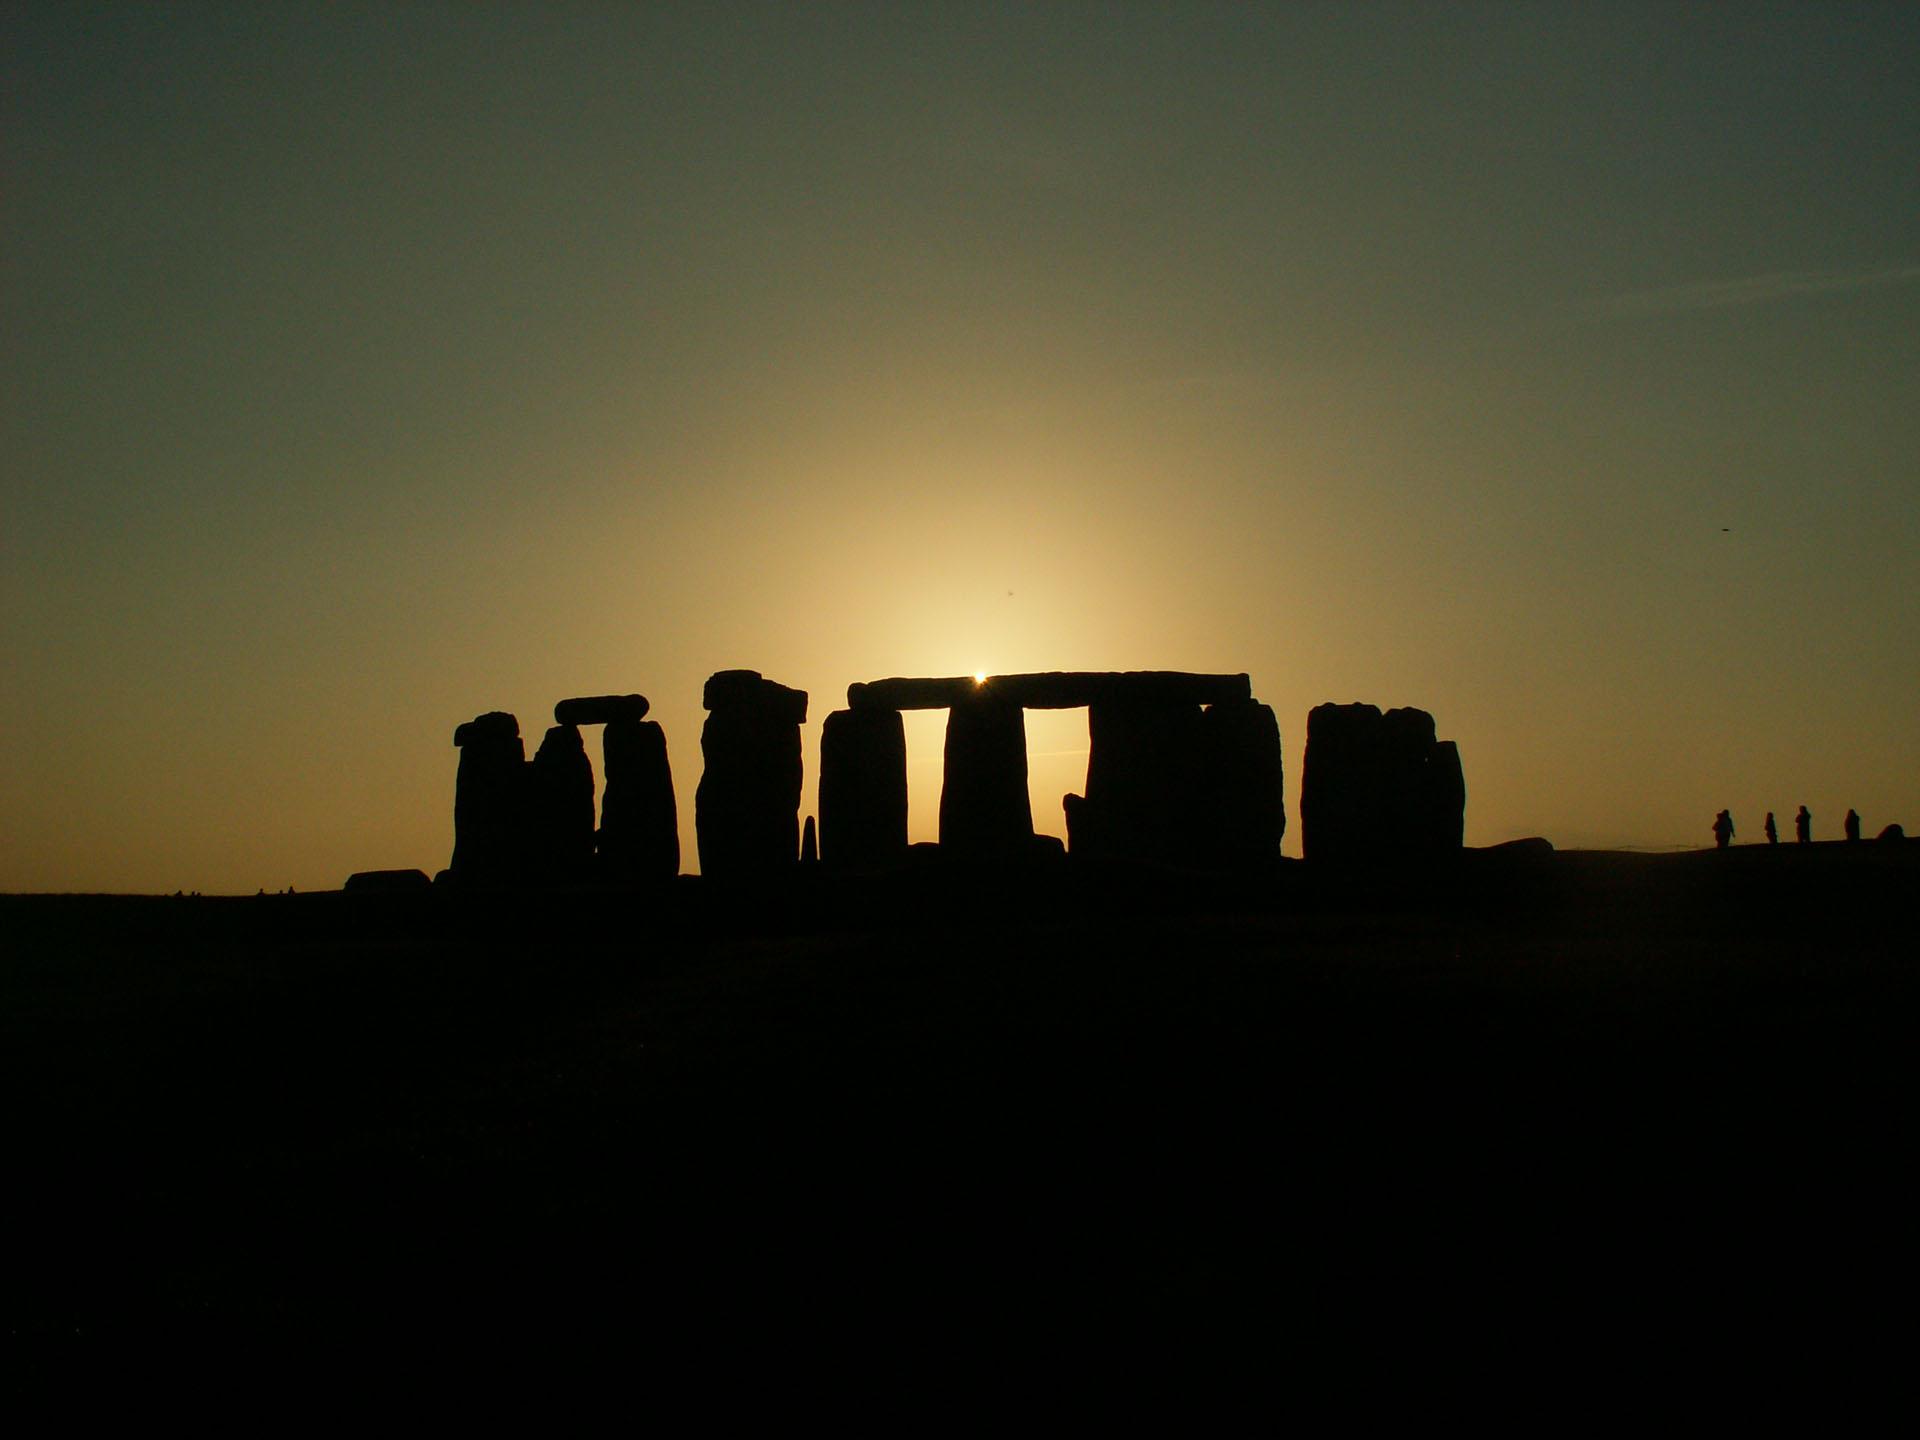 stonehenge10 Welcome to The Mysterious Stonehenge